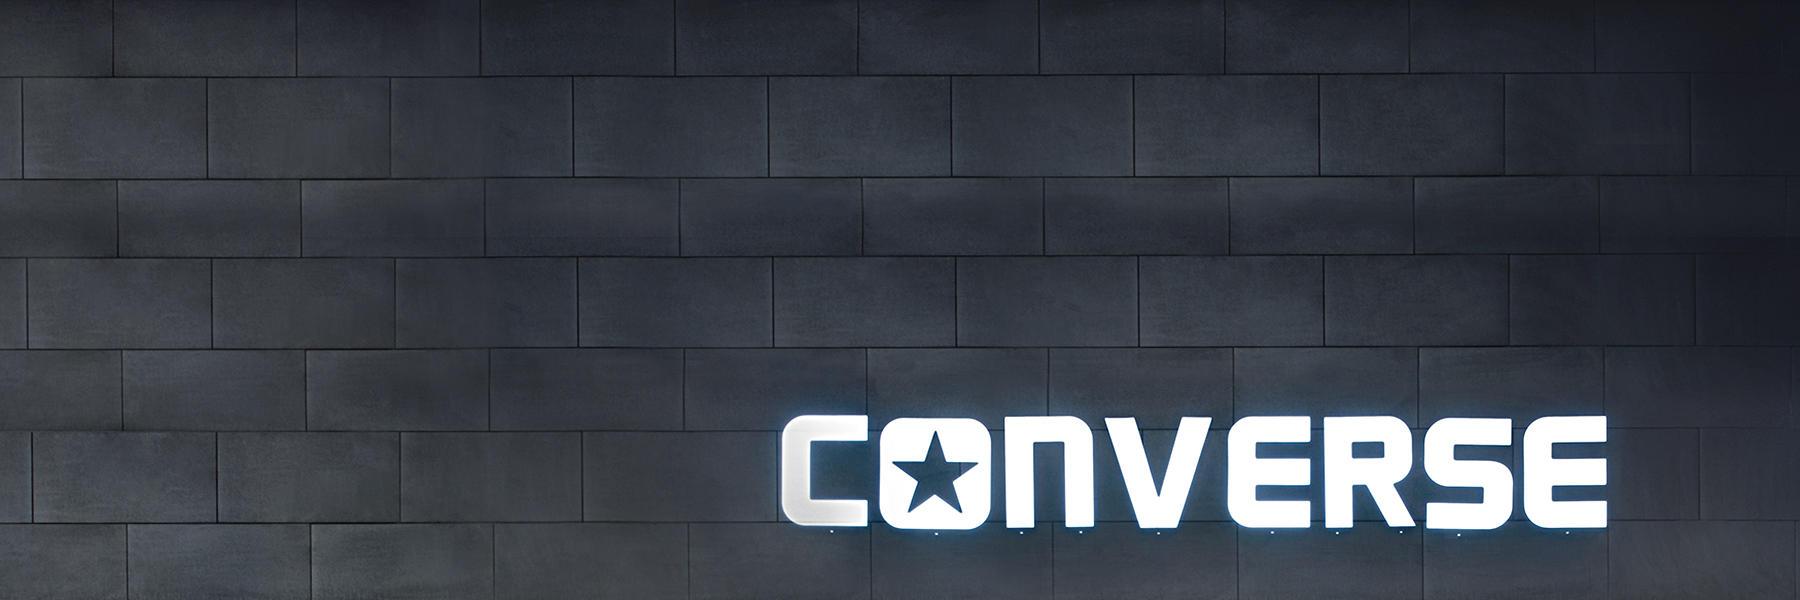 converse outlet petaluma